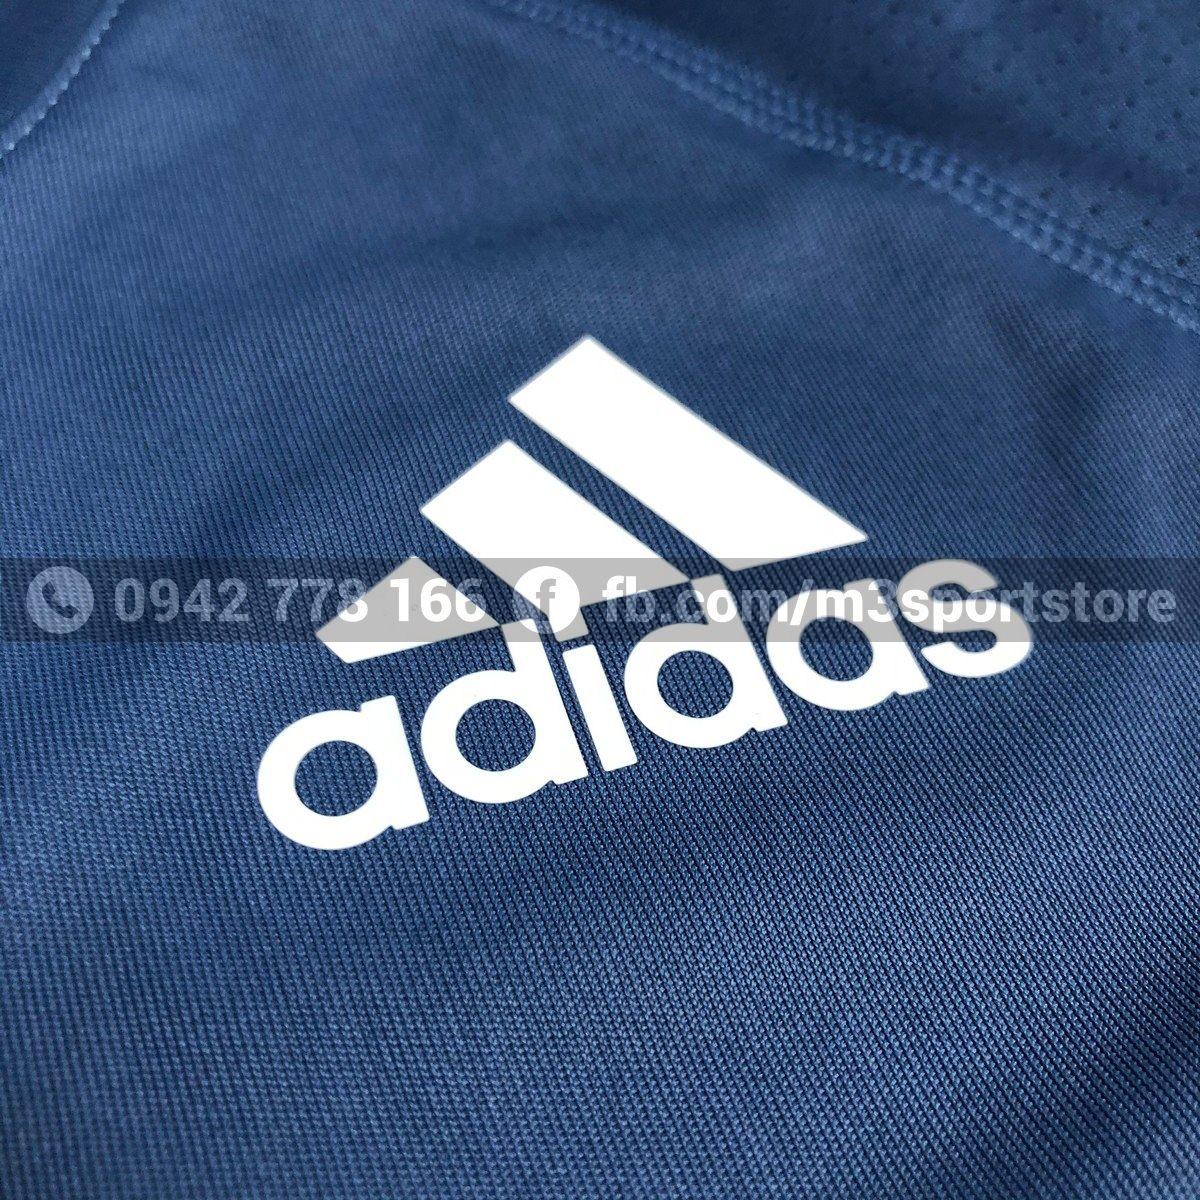 Áo thể thao nam Adidas Club Tennis GH7227